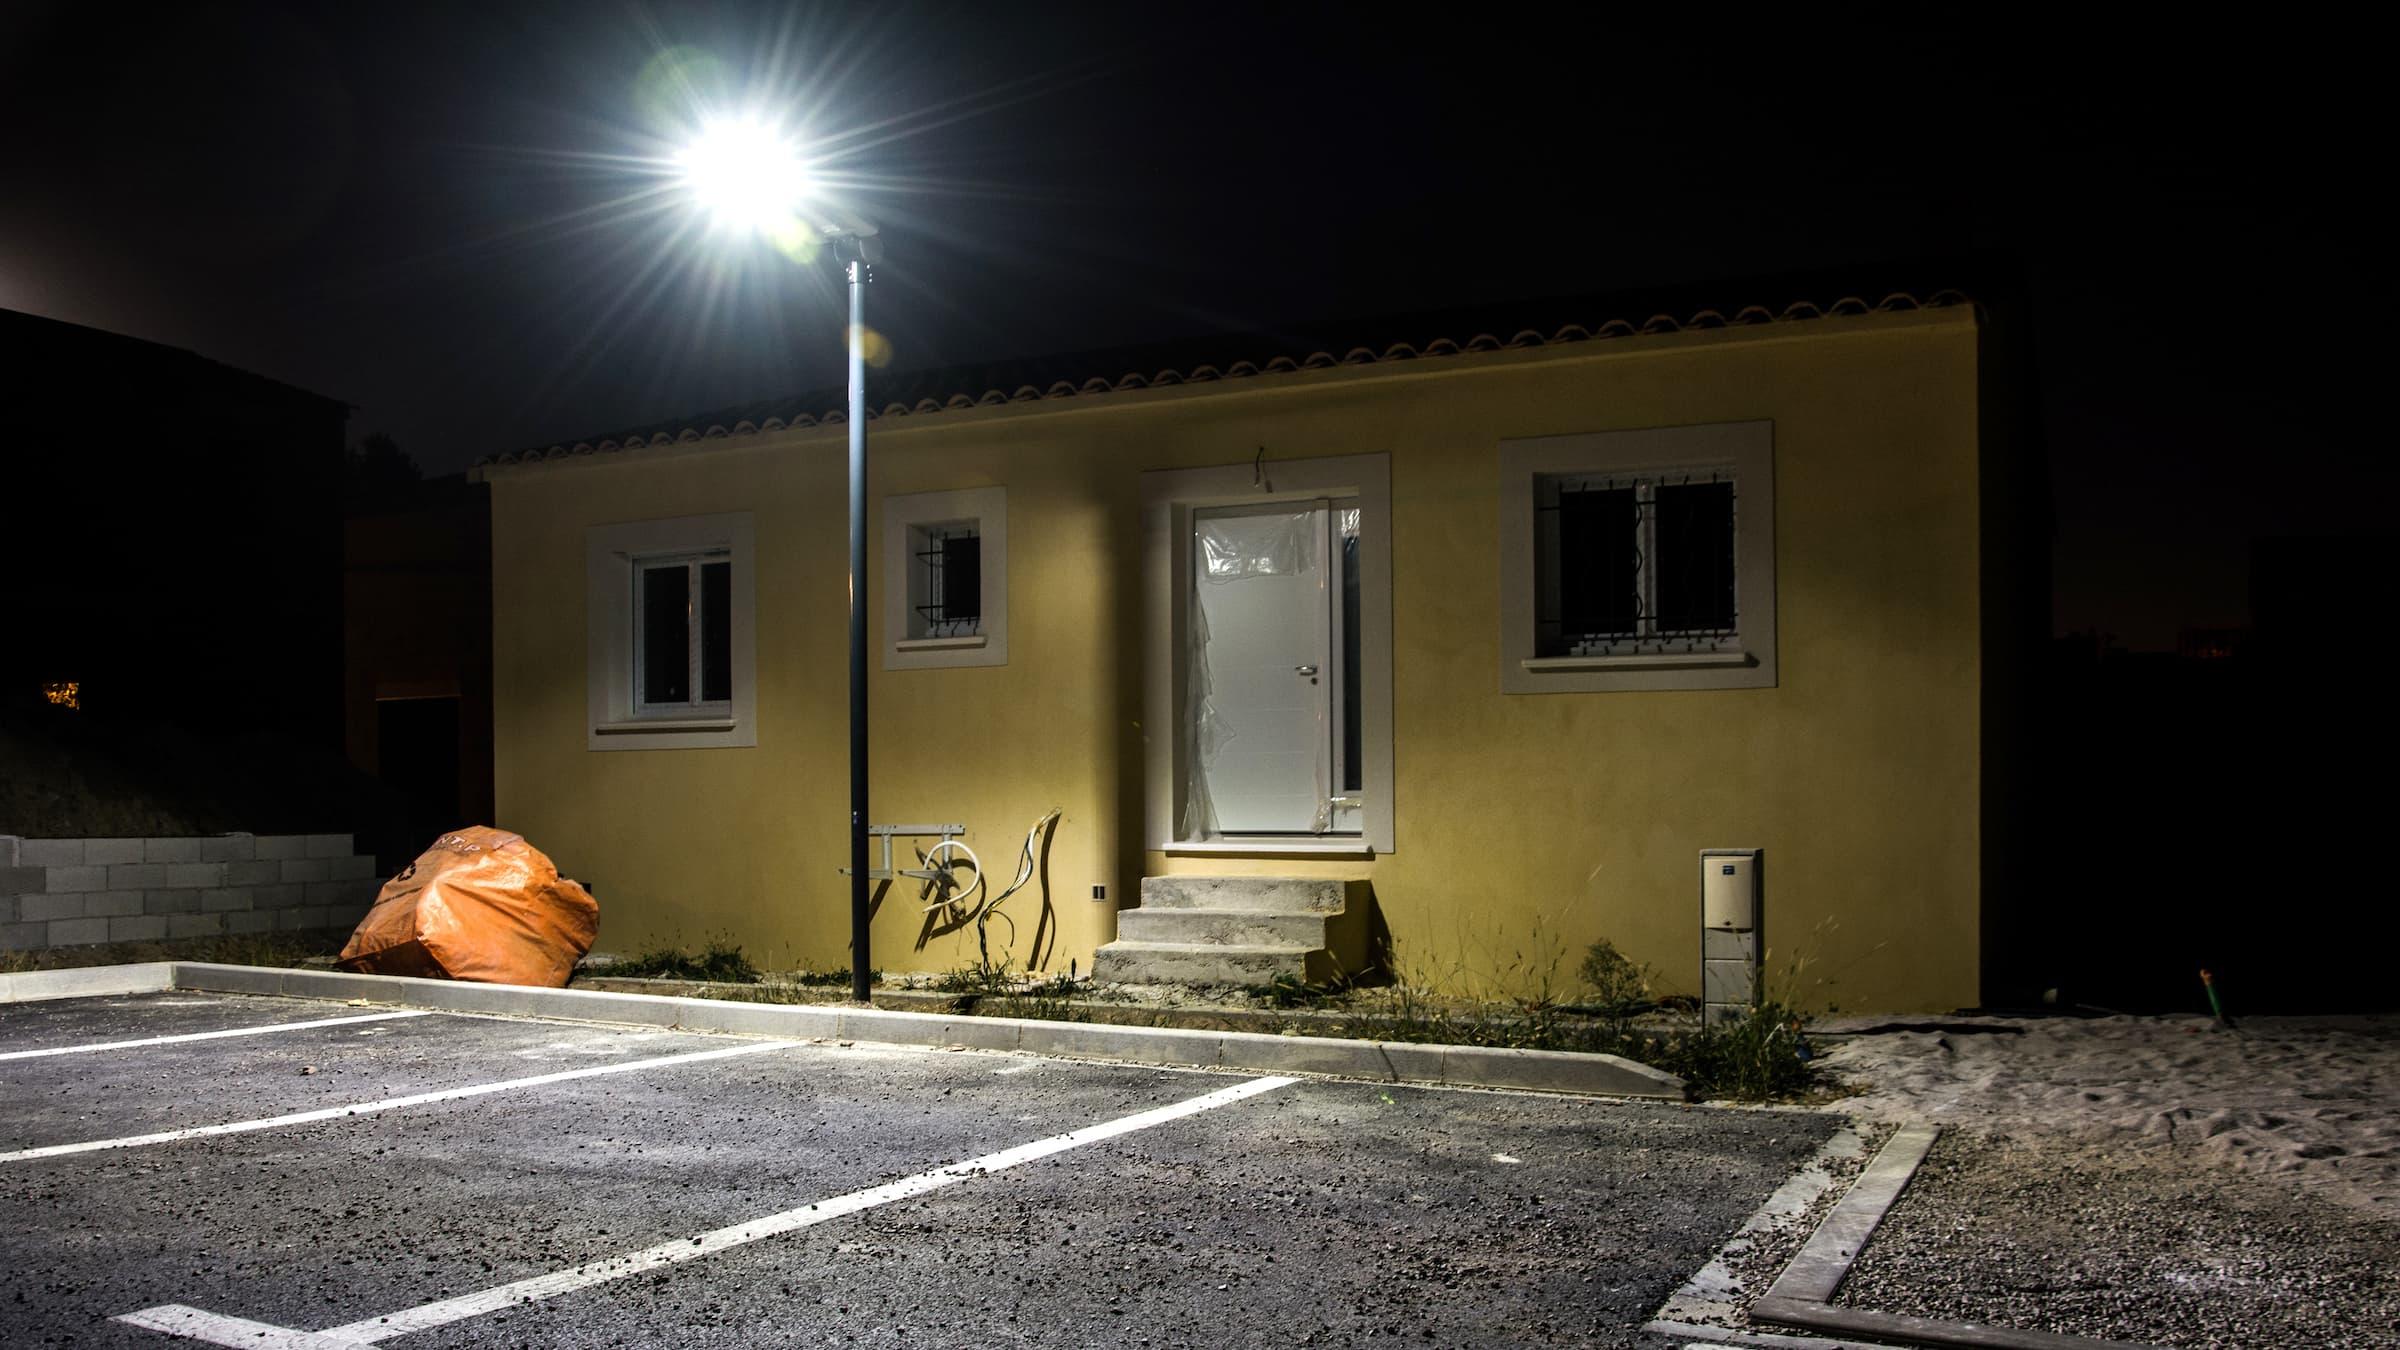 solar street light installation in a traditional village in France